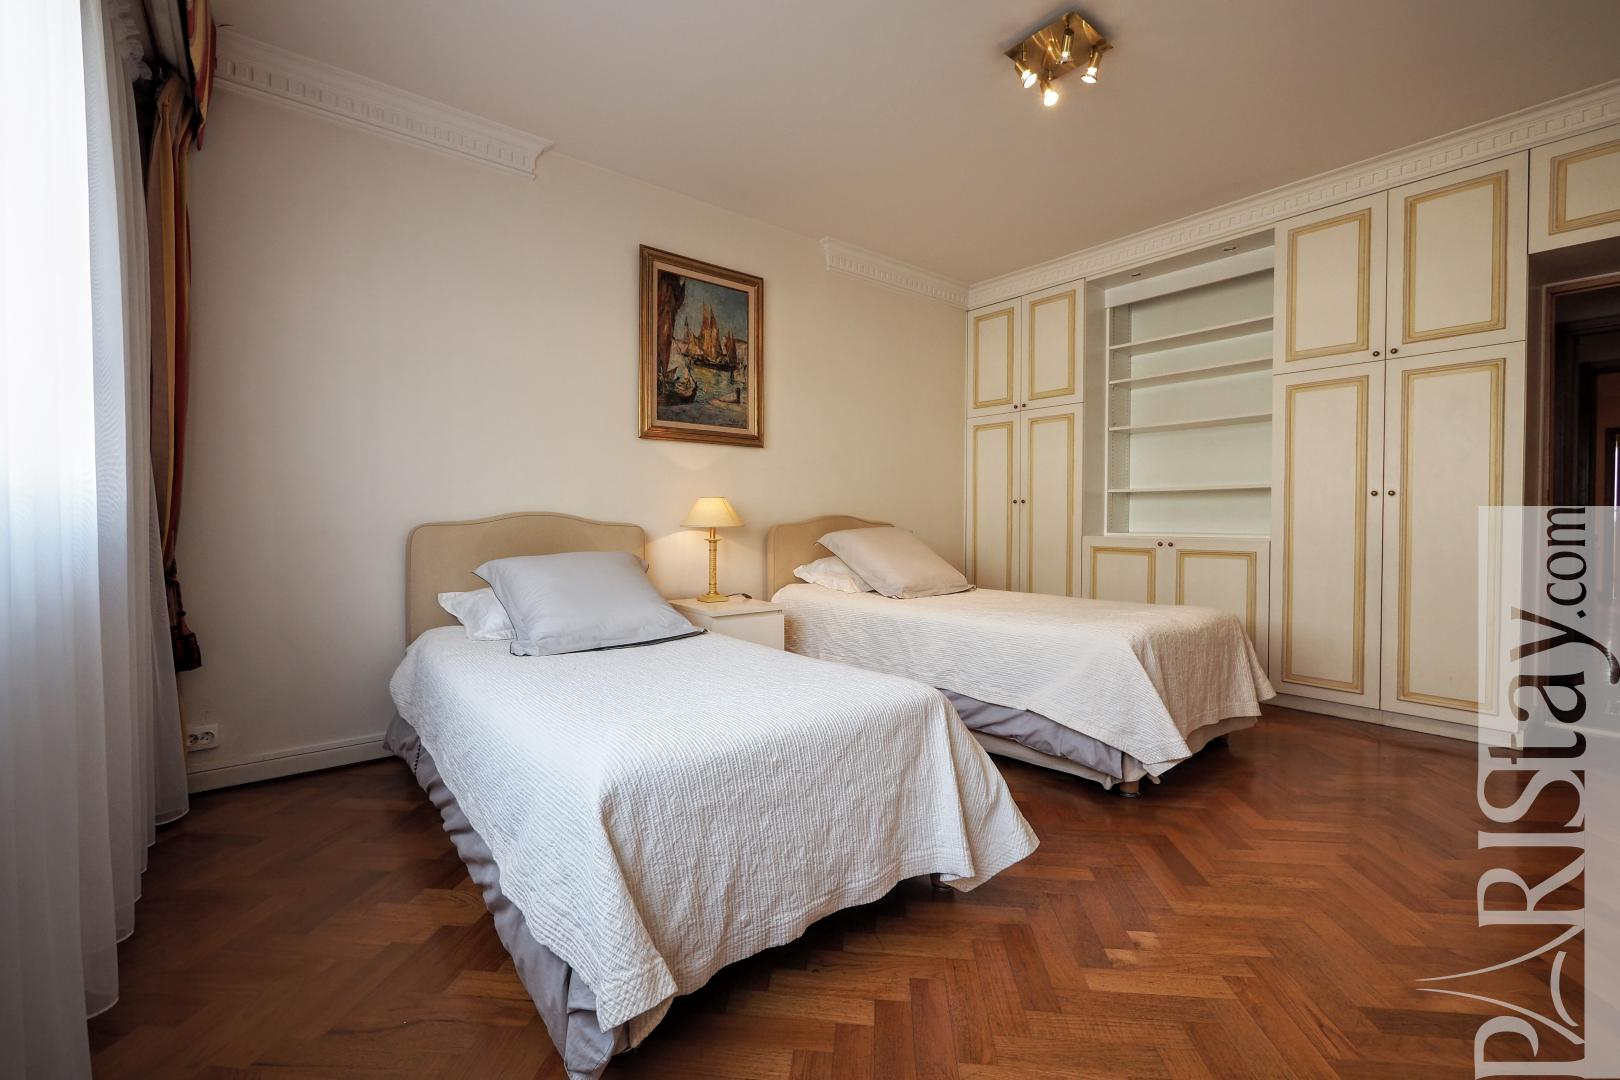 Paris france luxury apartment rental...